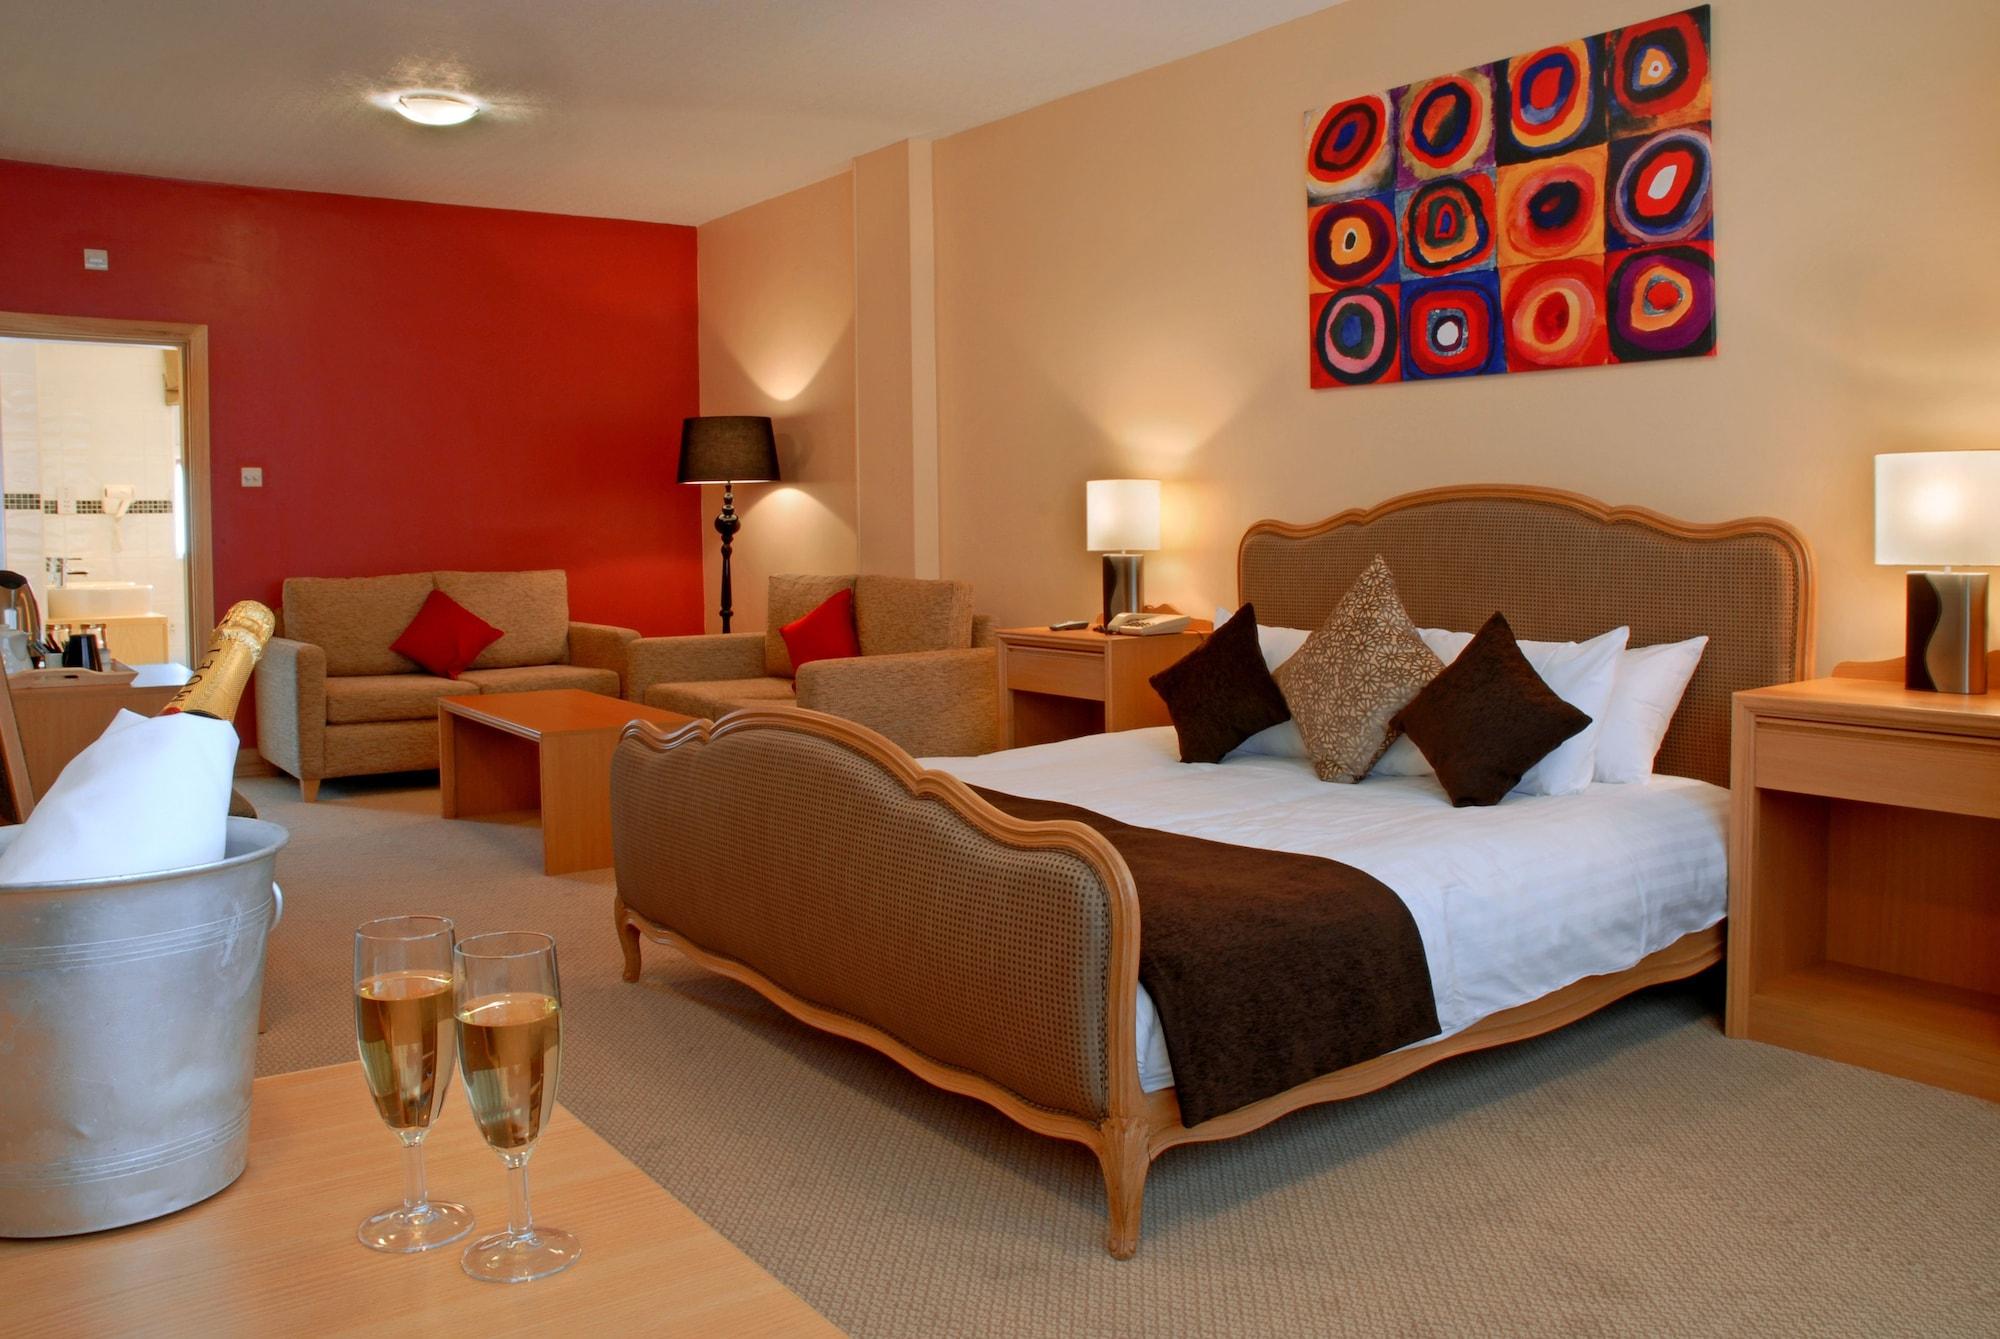 Antoinette Hotel Wimbledon, London